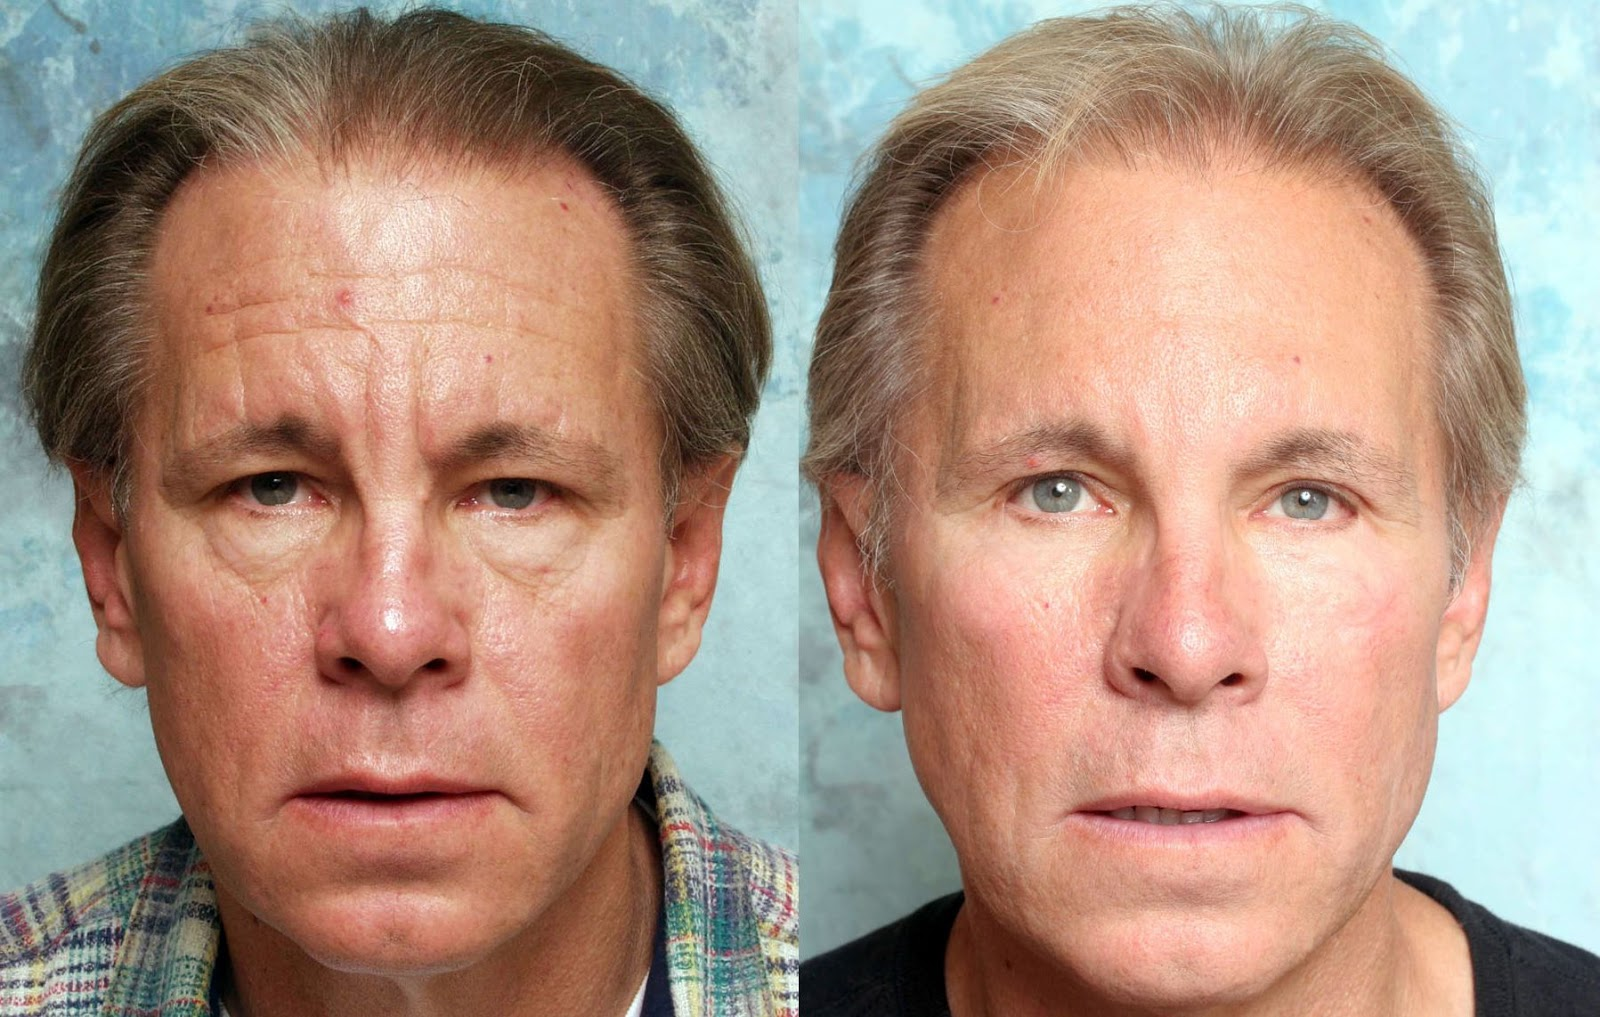 Face Yoga Nya Metoden F 246 R Sl 228 Tare Ansikte Utan Kirurgi